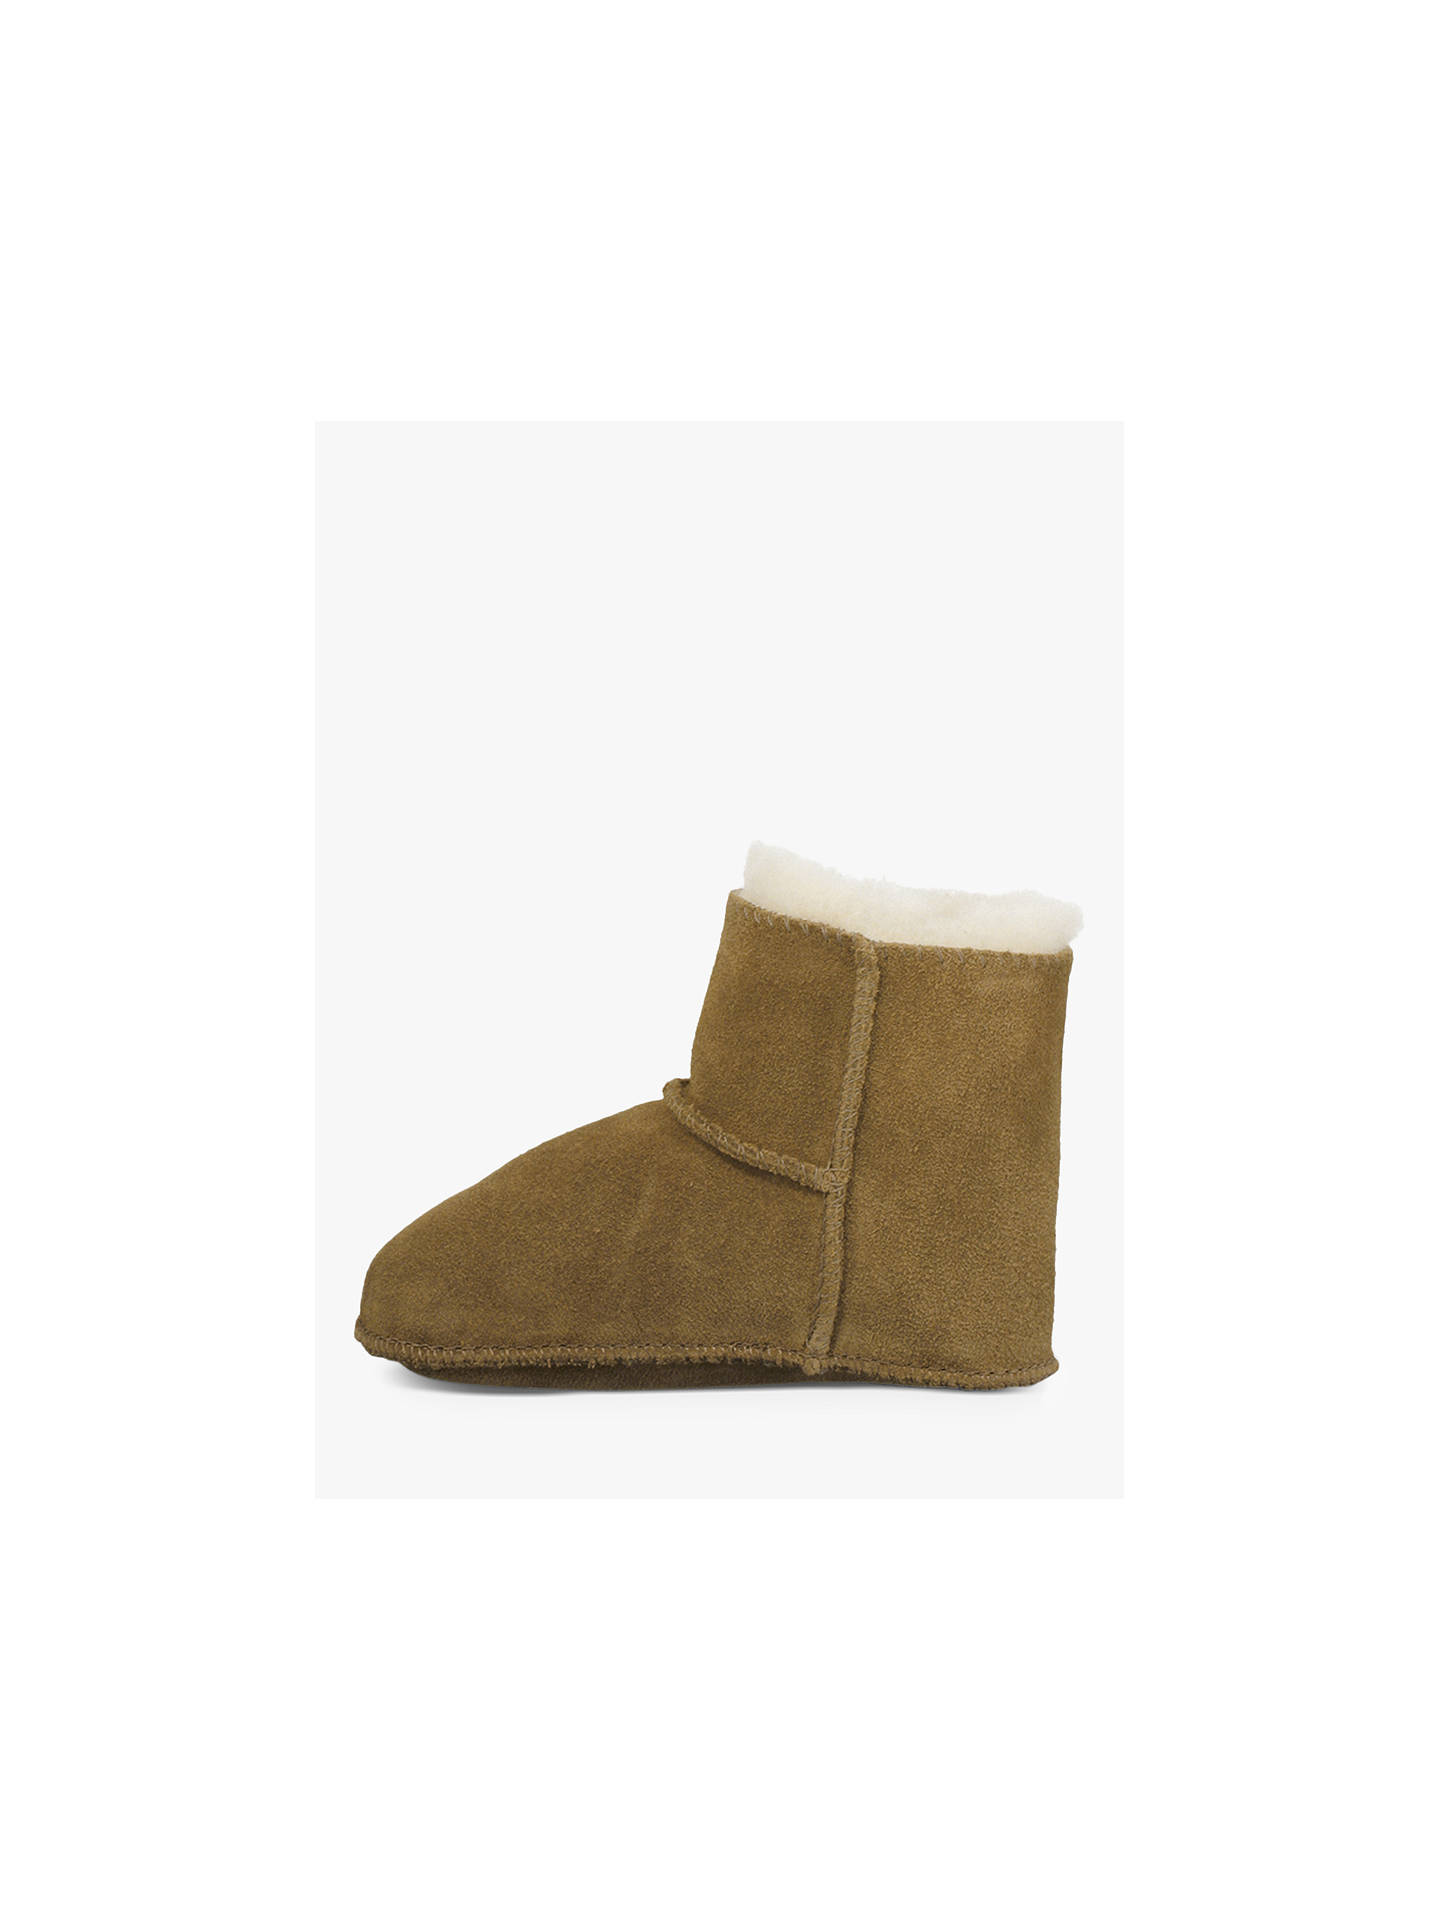 4e5d20090f8 UGG Children's Erin Boots, Chestnut